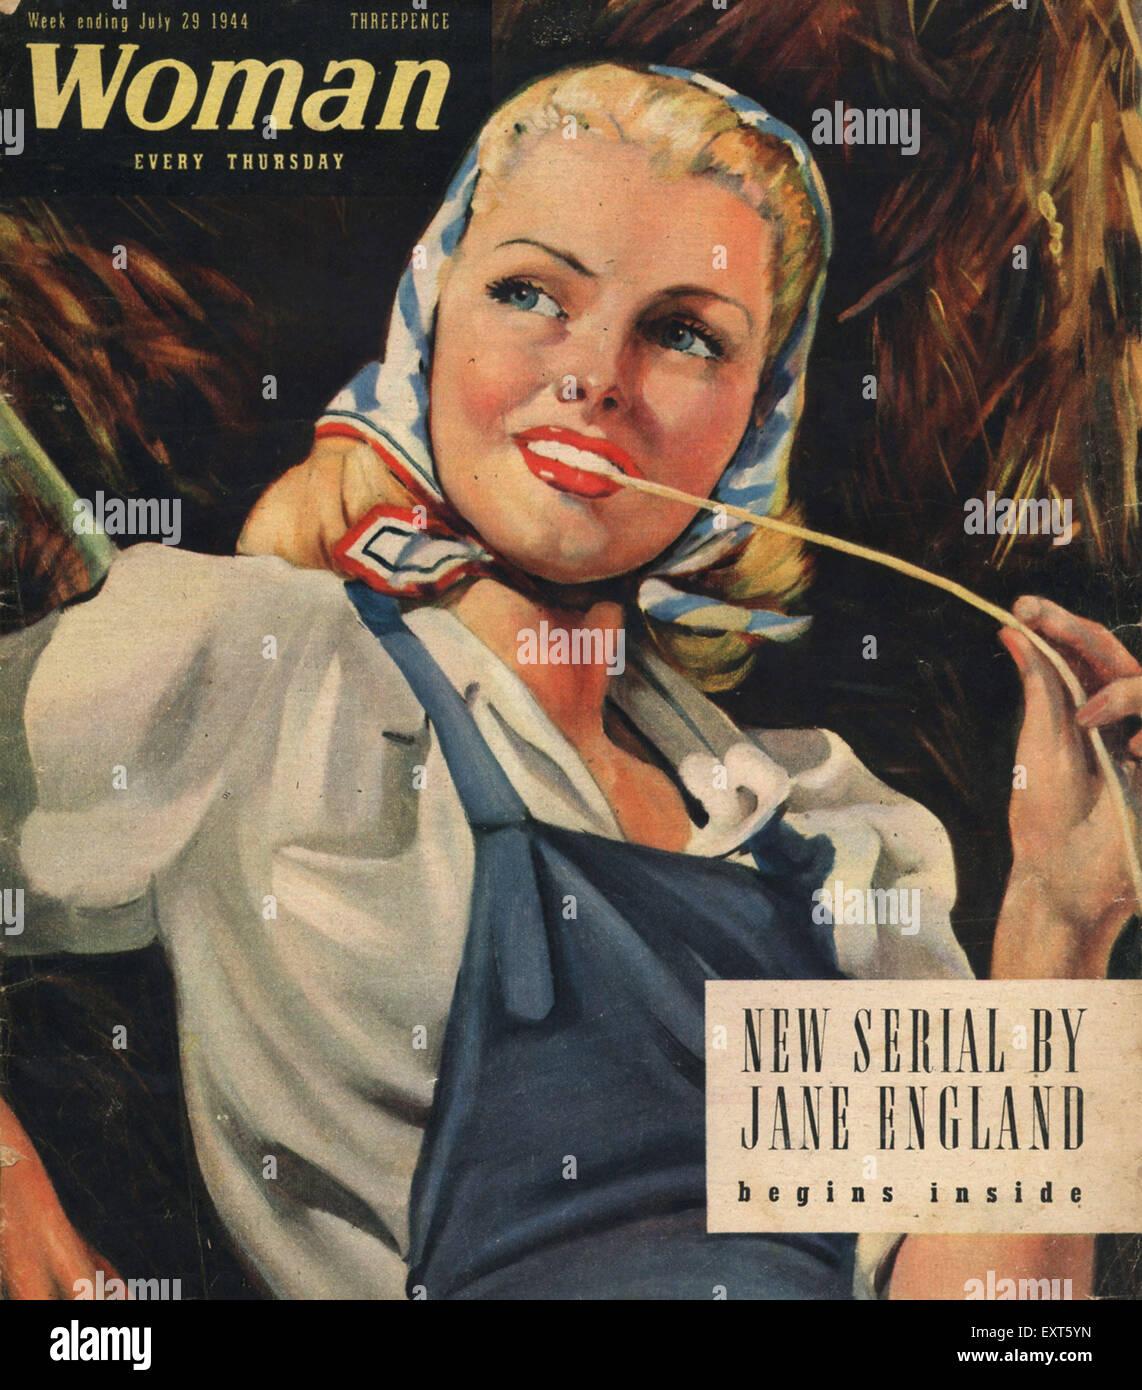 1940s UK woman Magazine Cover - Stock Image